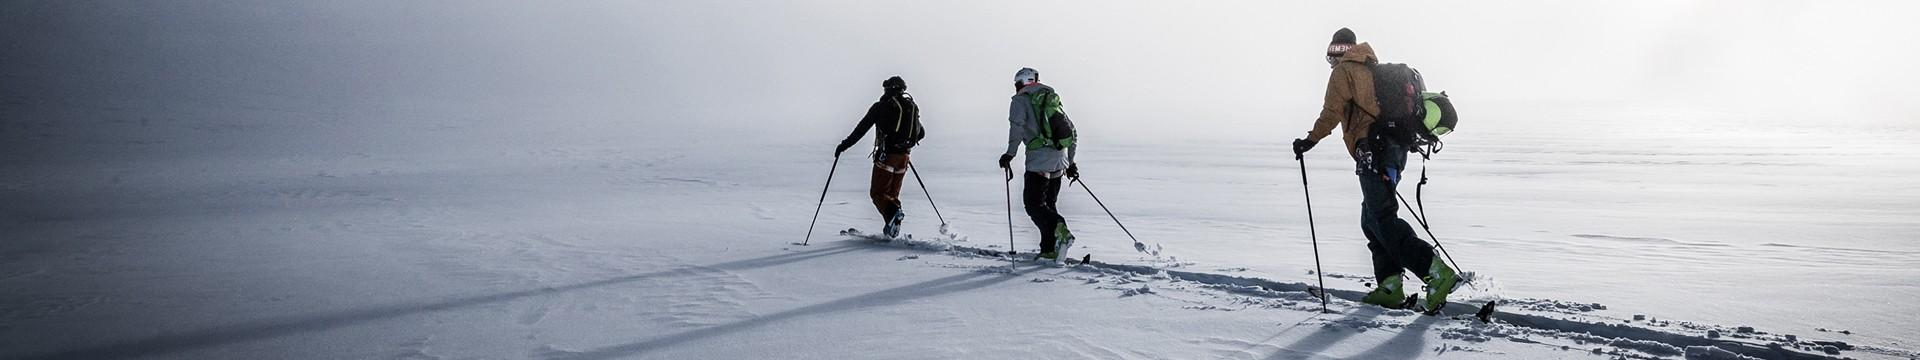 ski-rando-01-8786